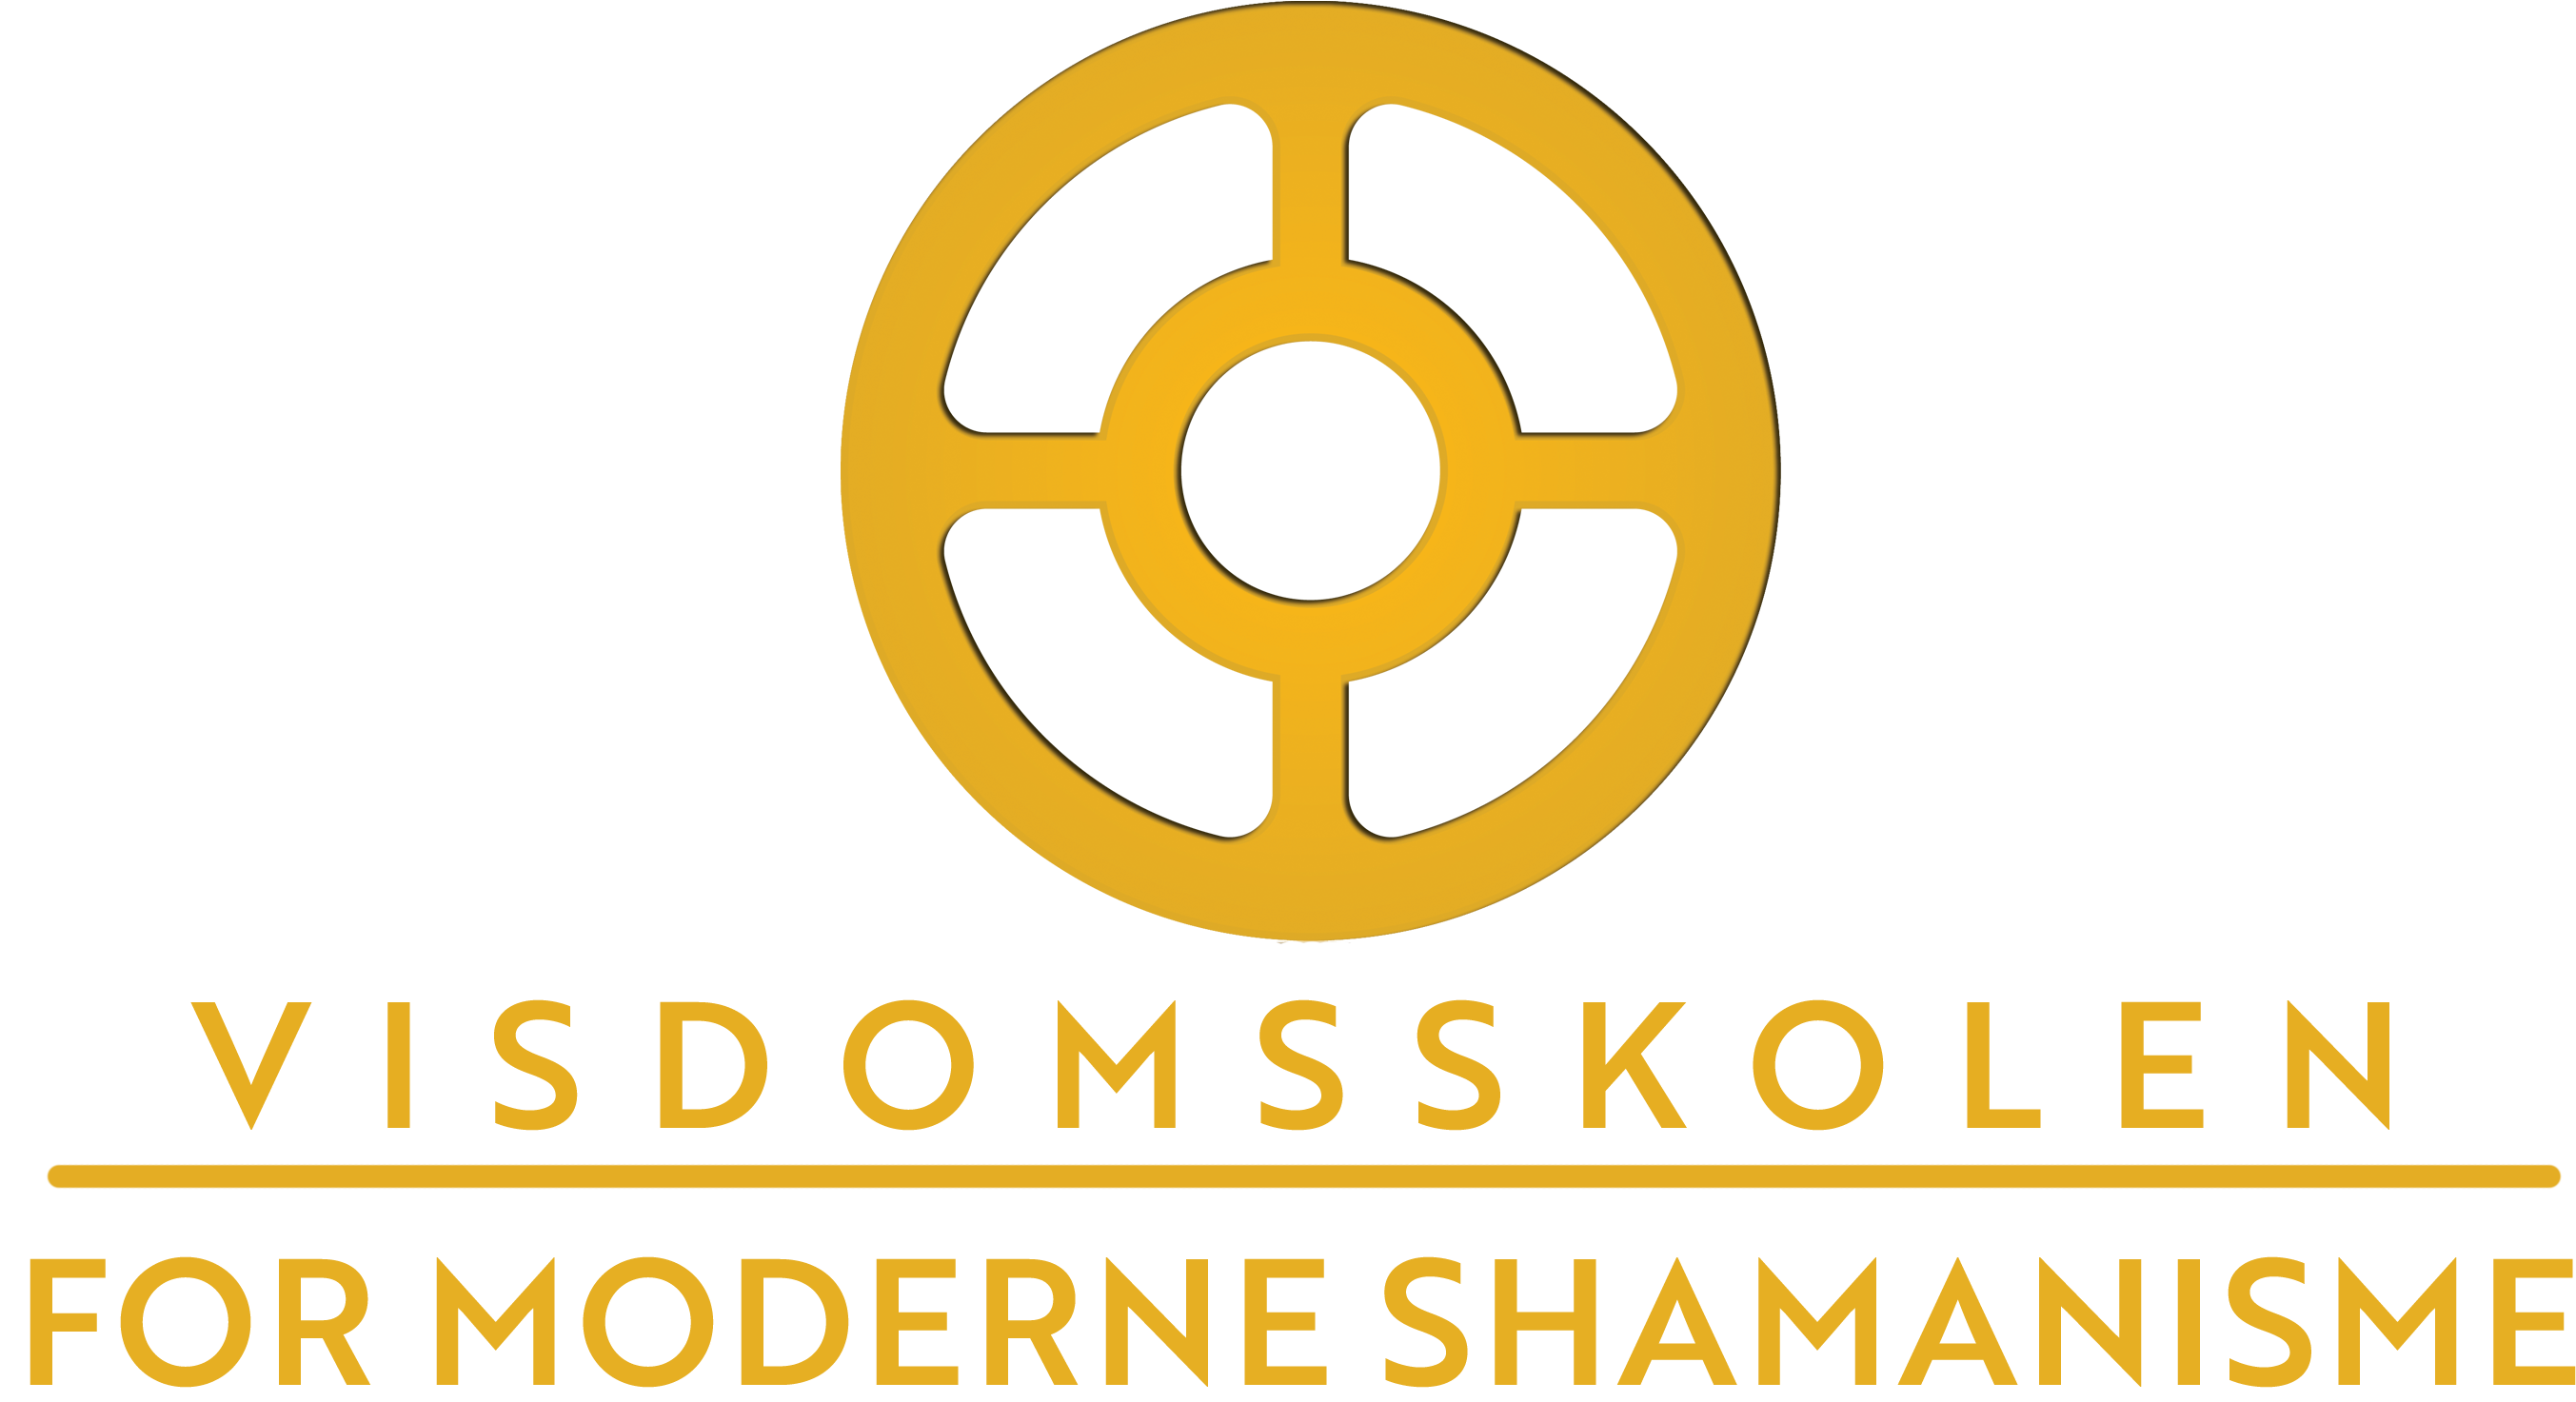 Visdomsskolen for Moderne Shamanisme